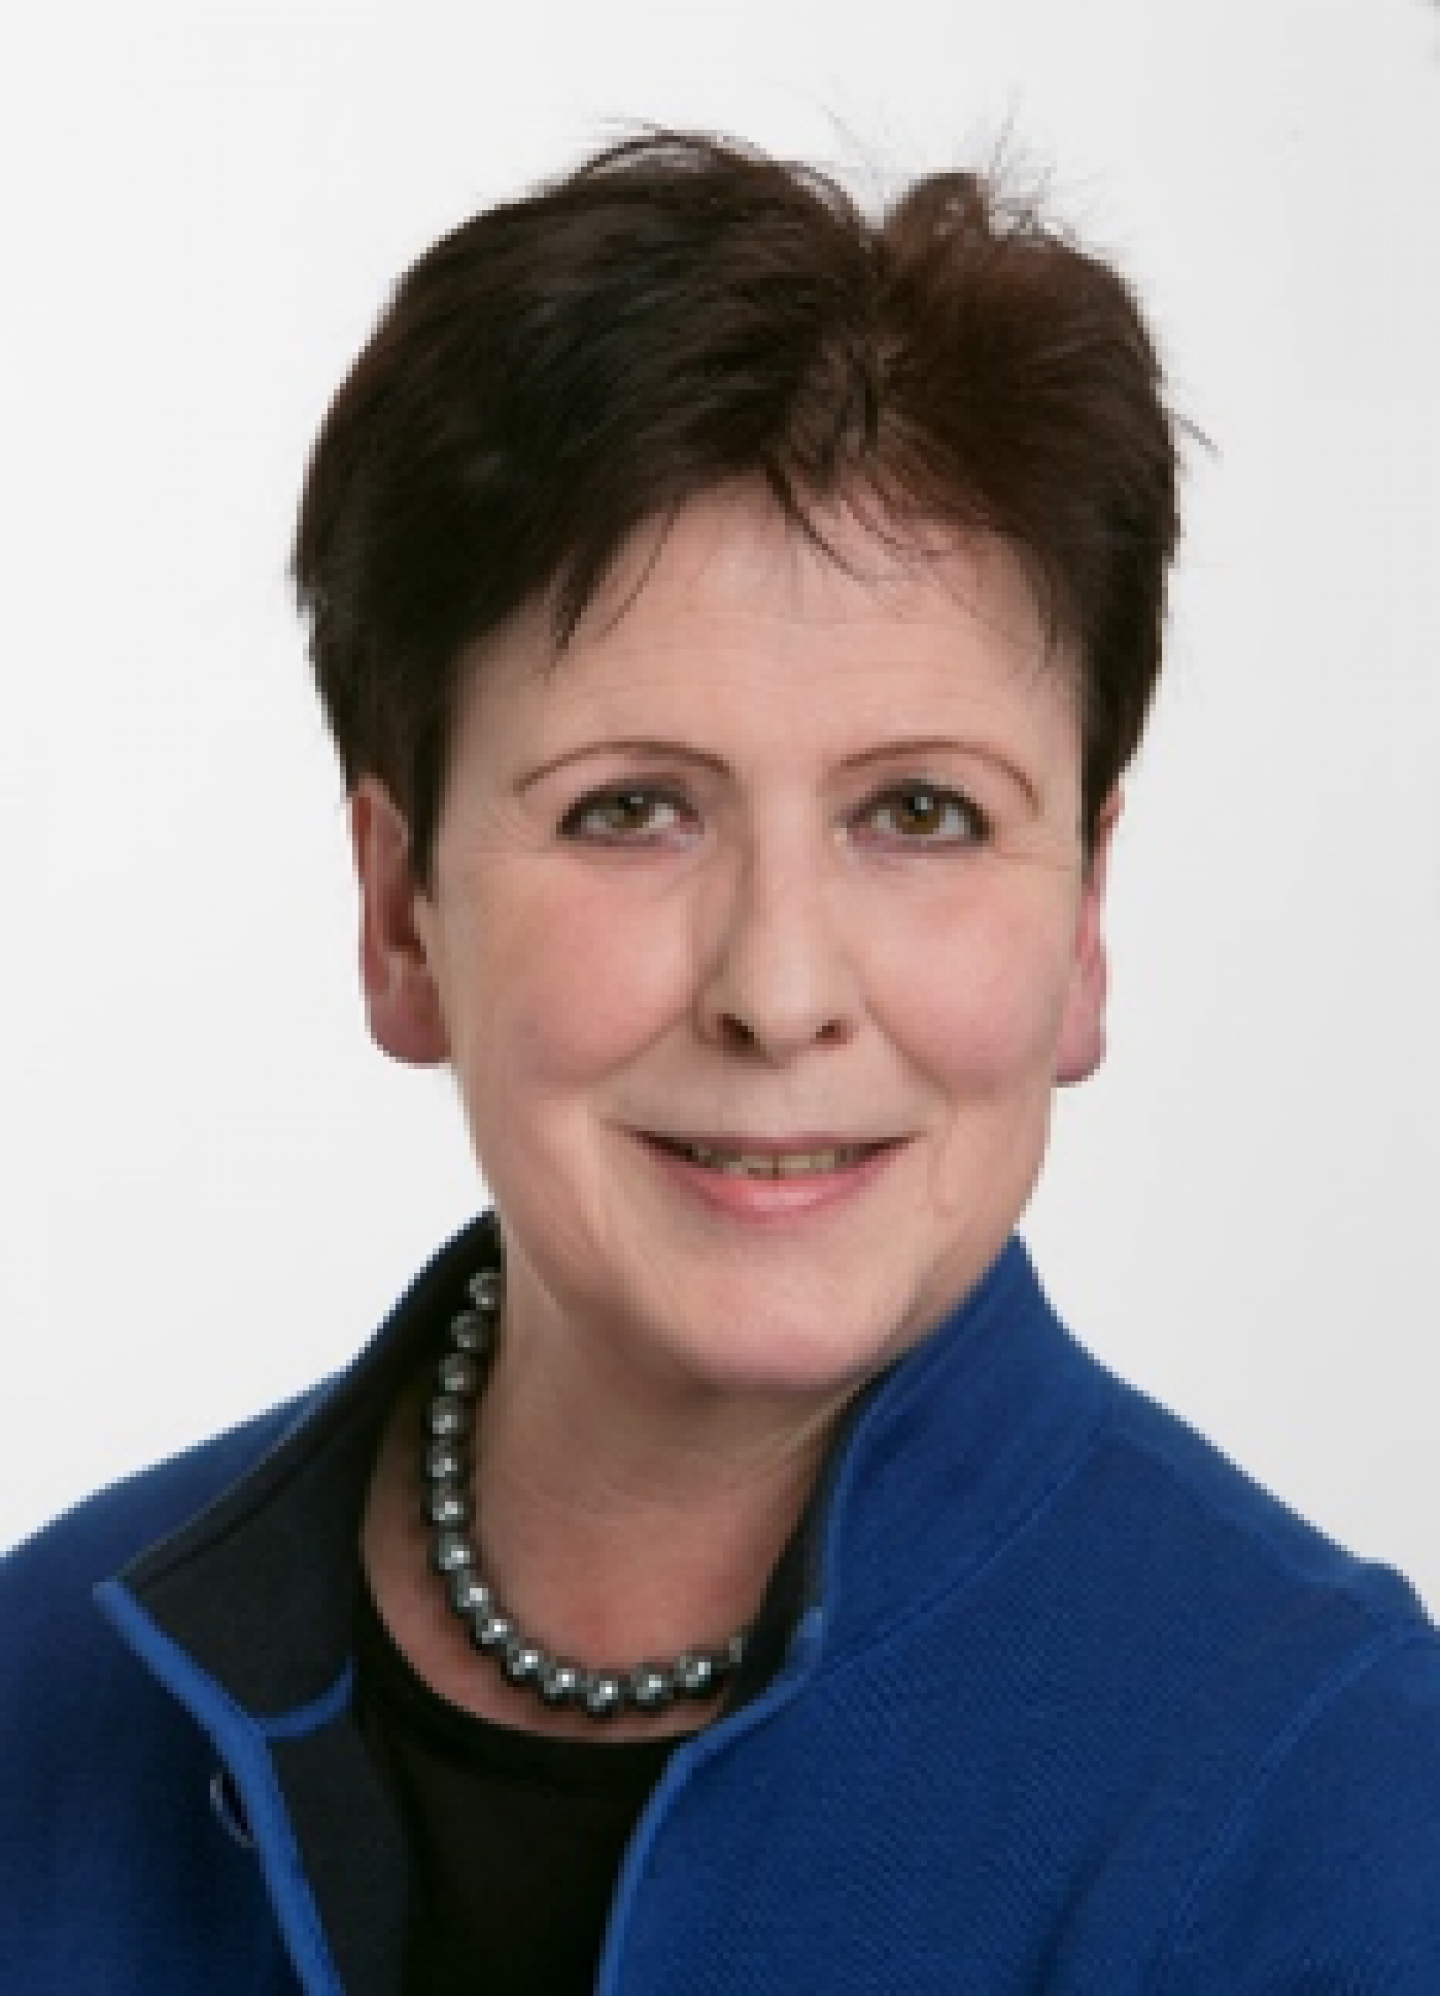 Gabrielle Heimgartner